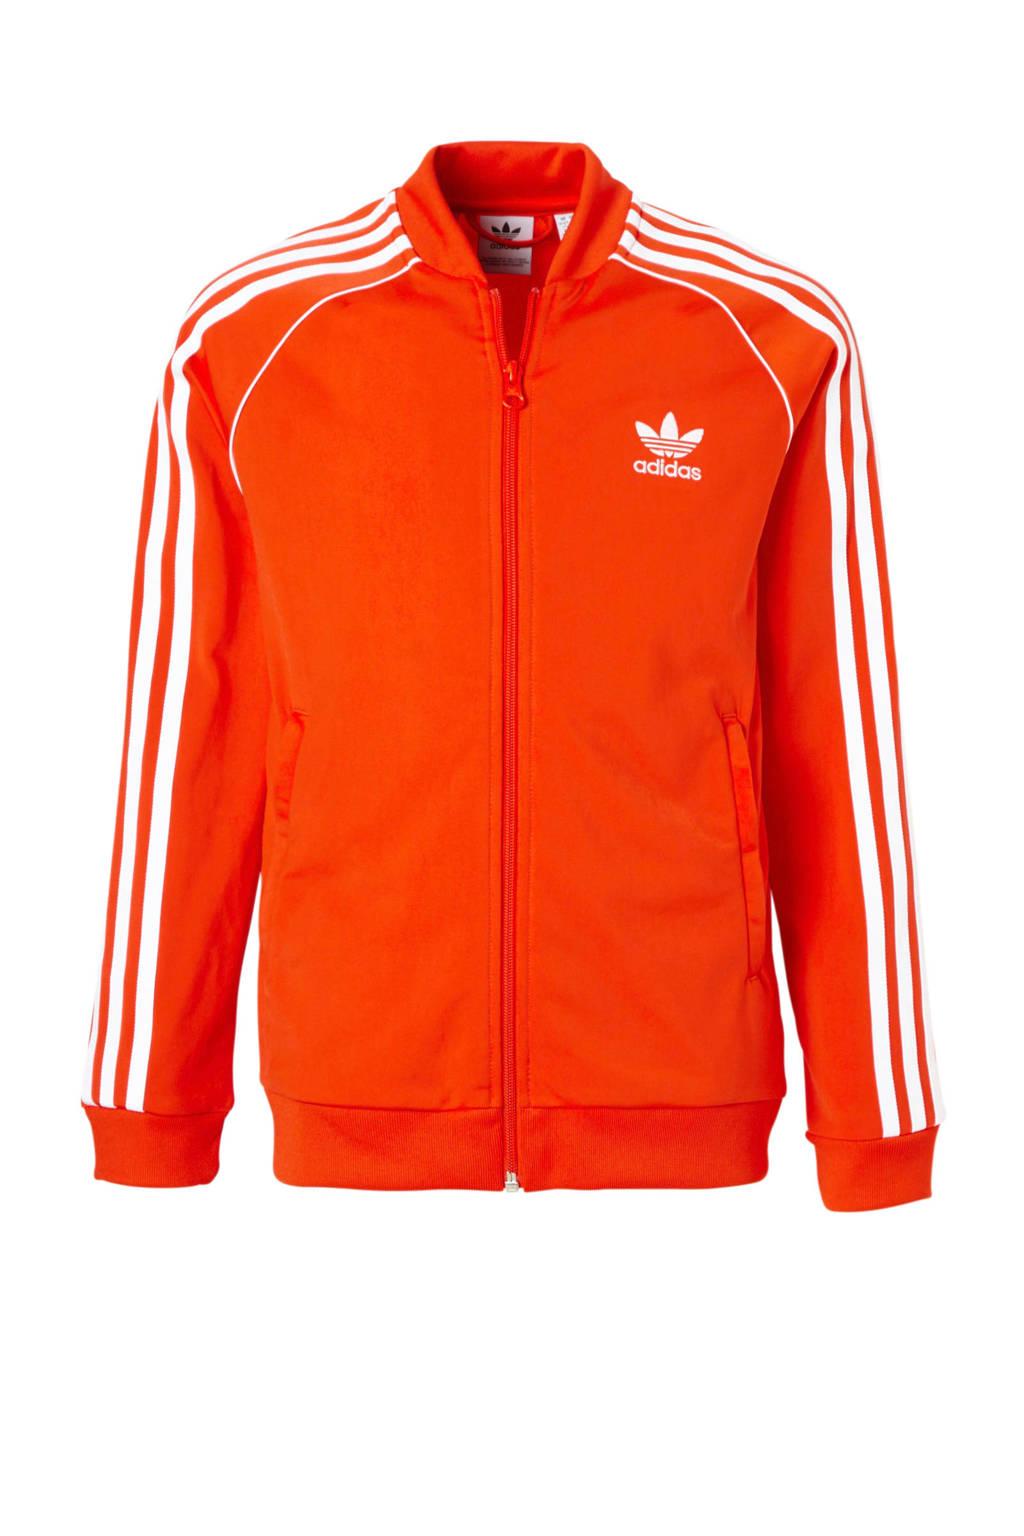 621986f5e72 adidas originals vest oranje | wehkamp